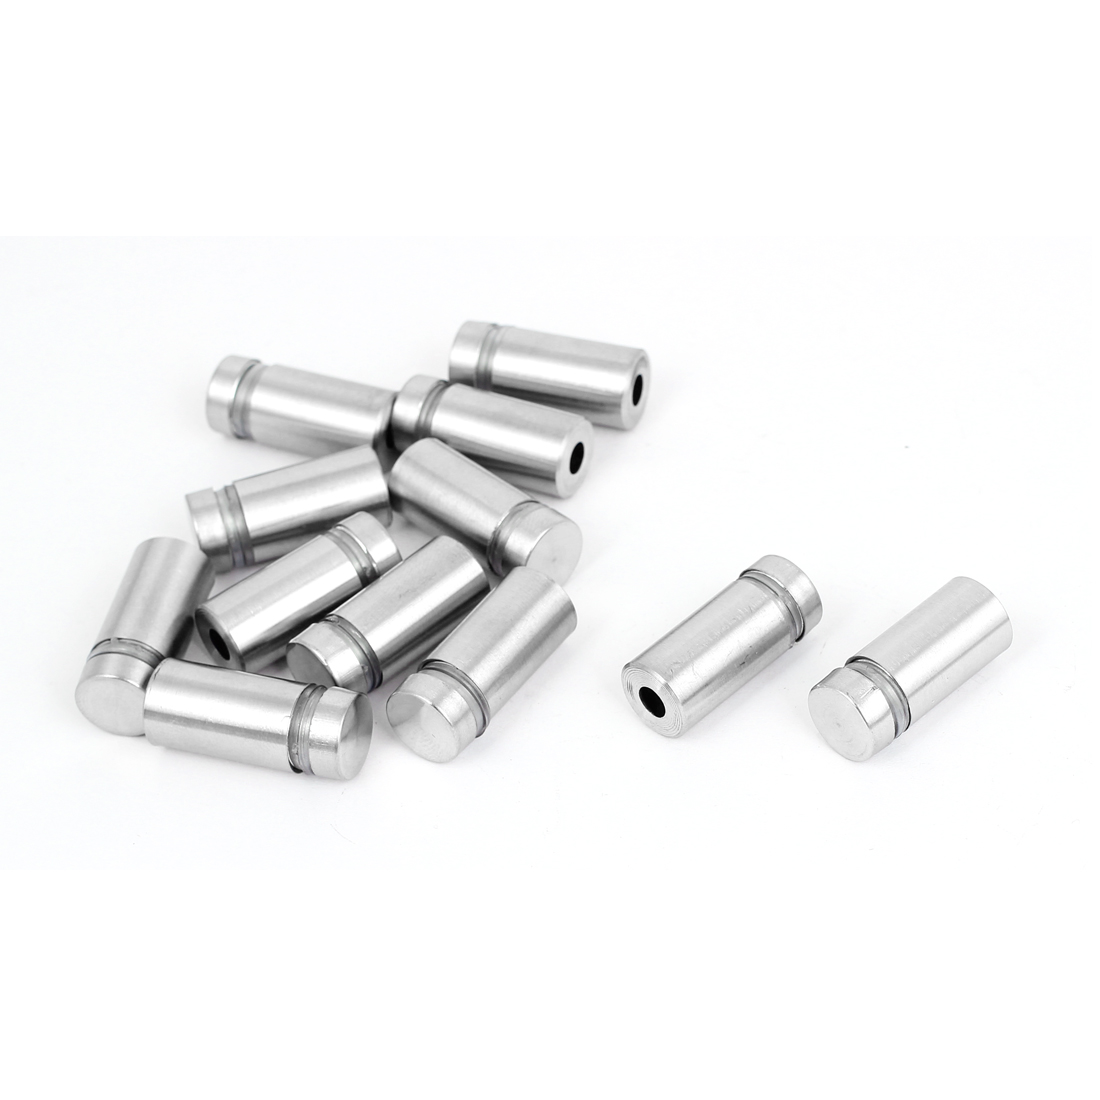 12mm x 25mm Stainless Steel Advertising Frameless Glass Standoff Pins 12pcs